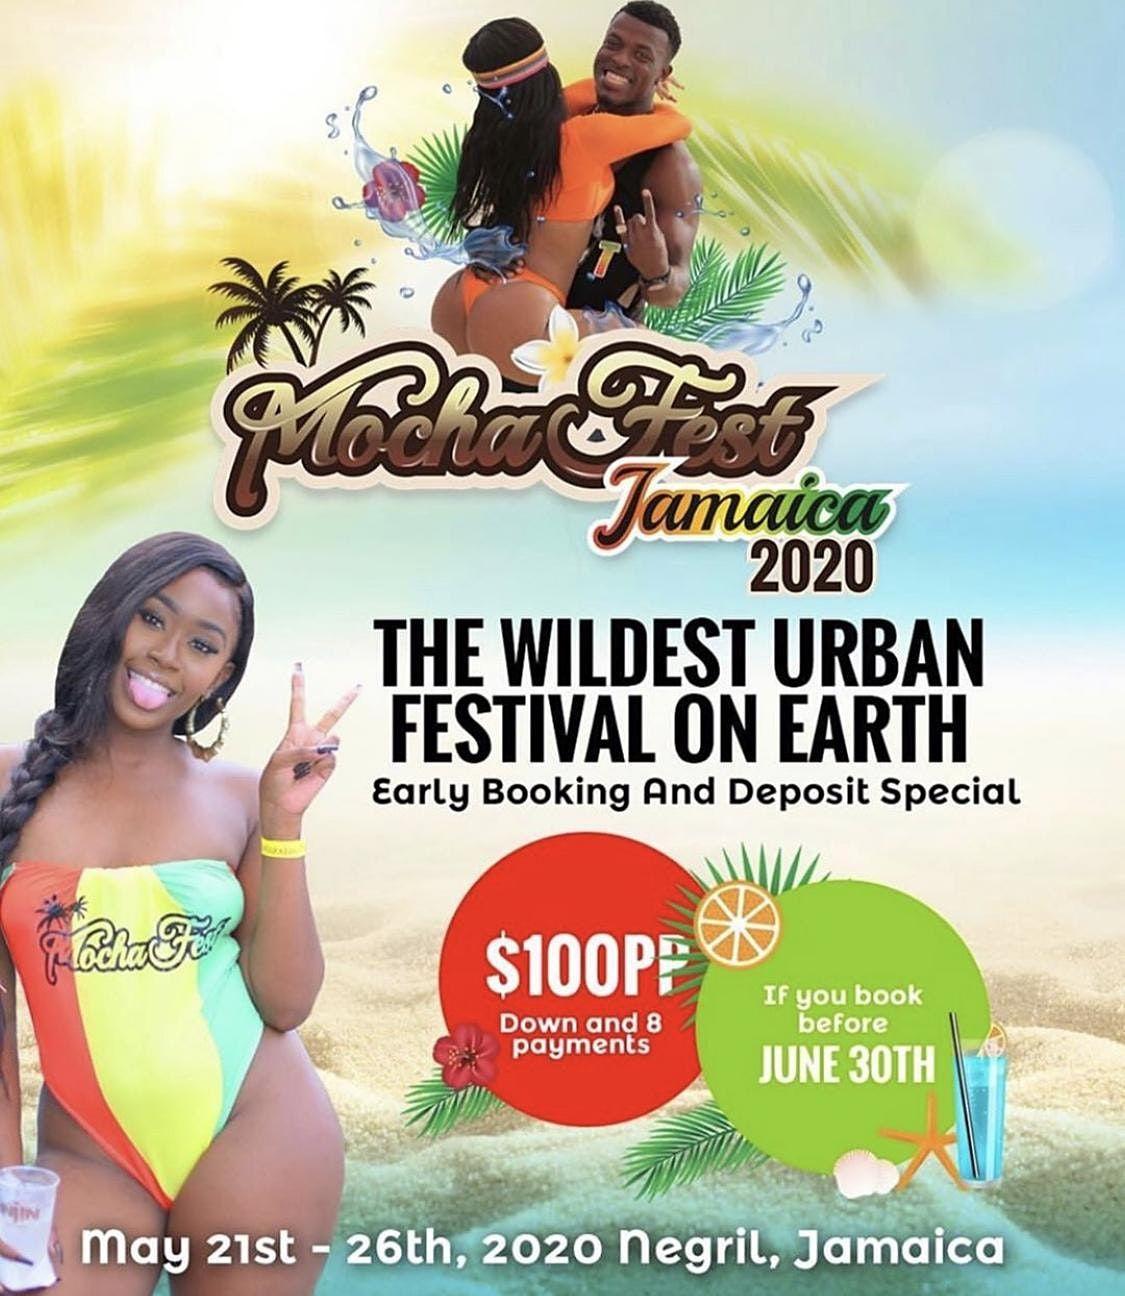 Mocha Fest Jamaica - Hideaway at Royalton Negril All